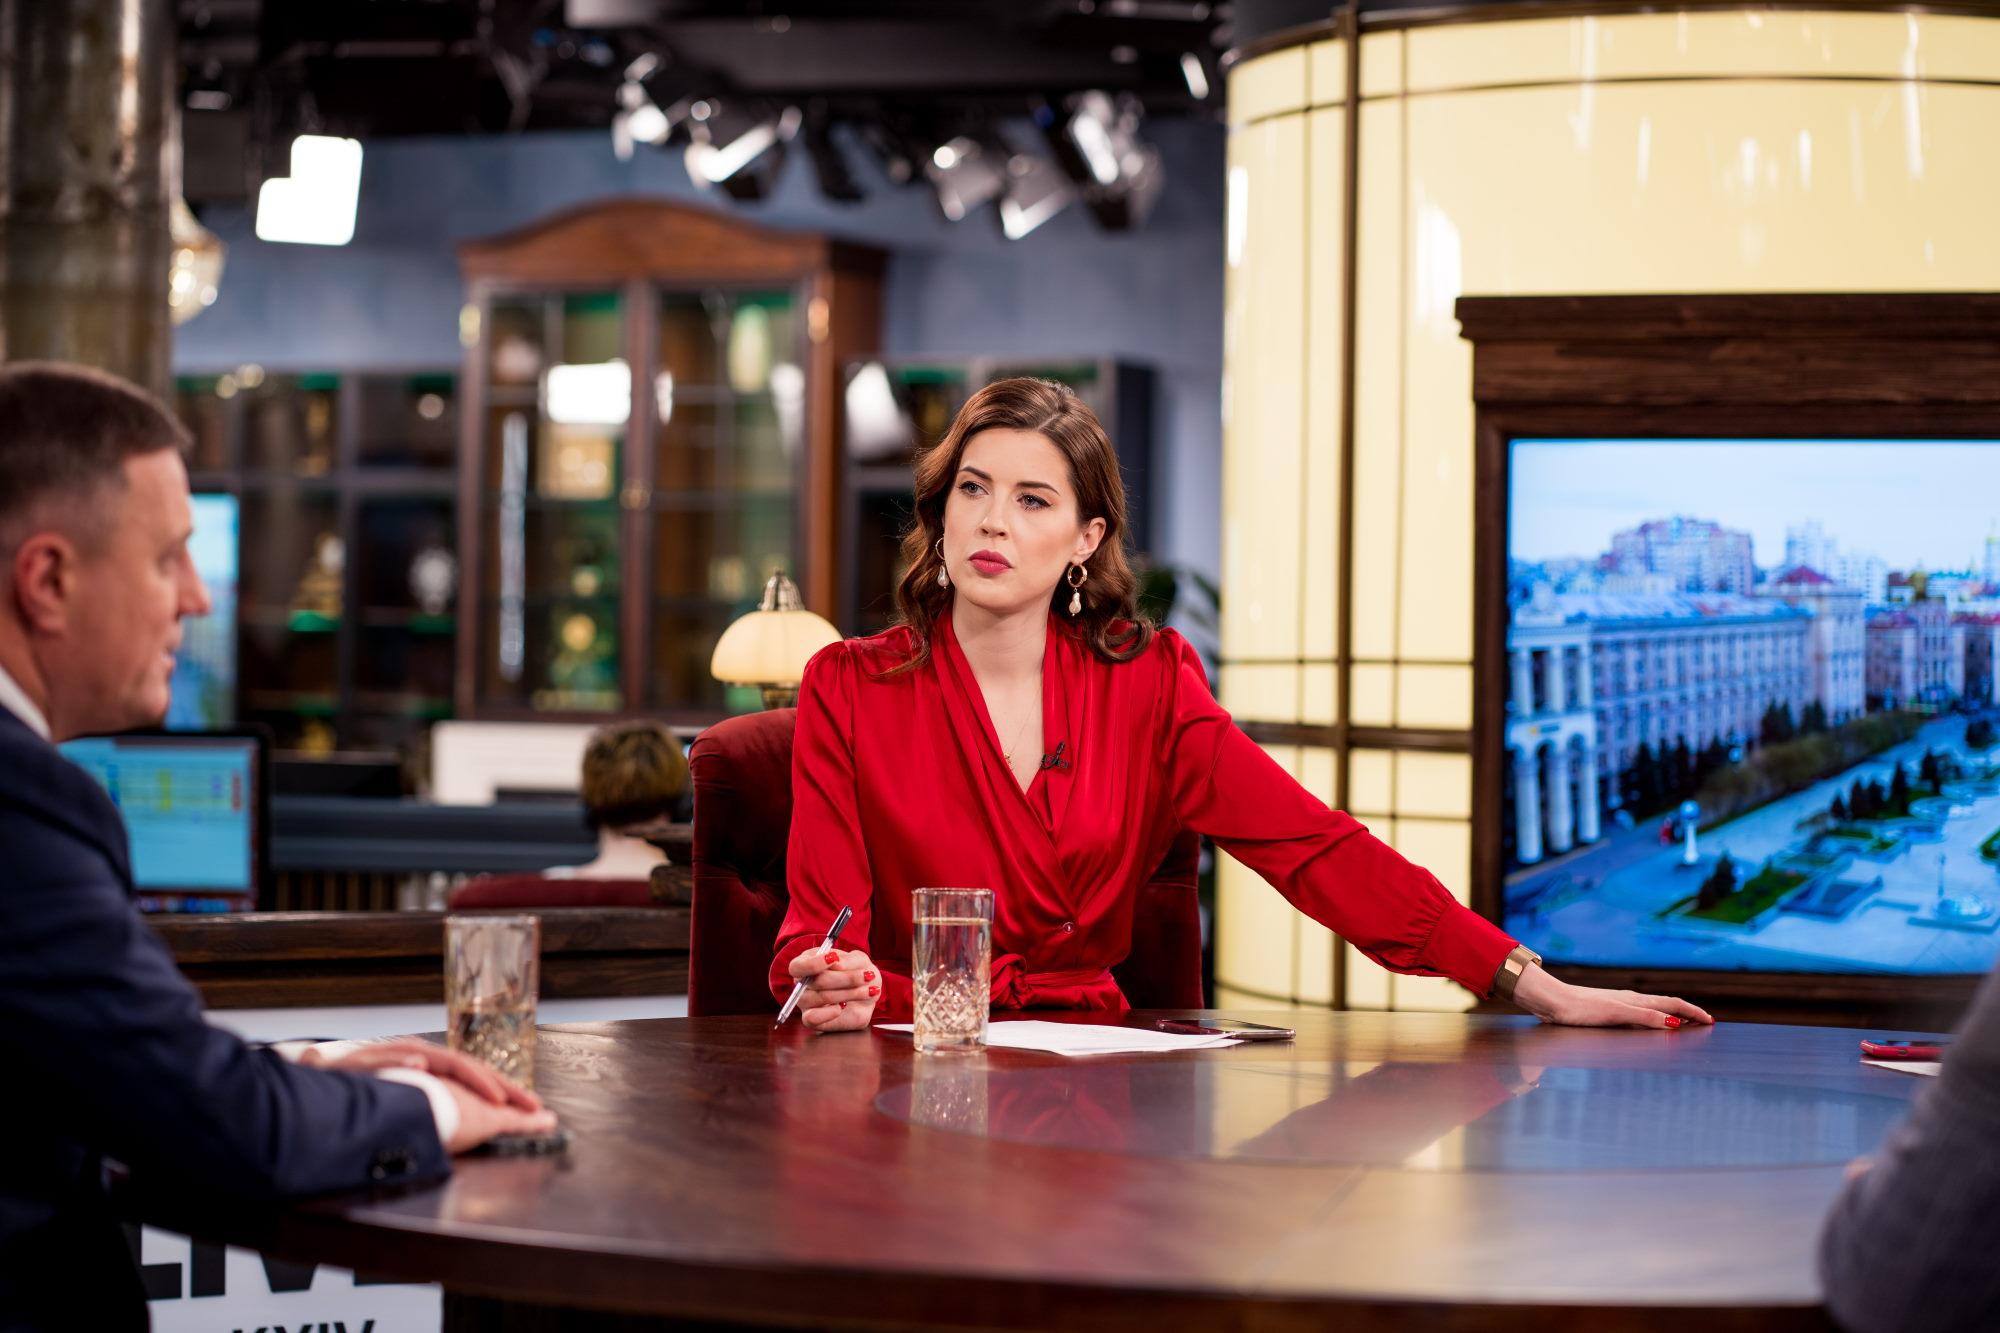 Елена Халилова, тележурналист, телеведущая («День.LIVE»)